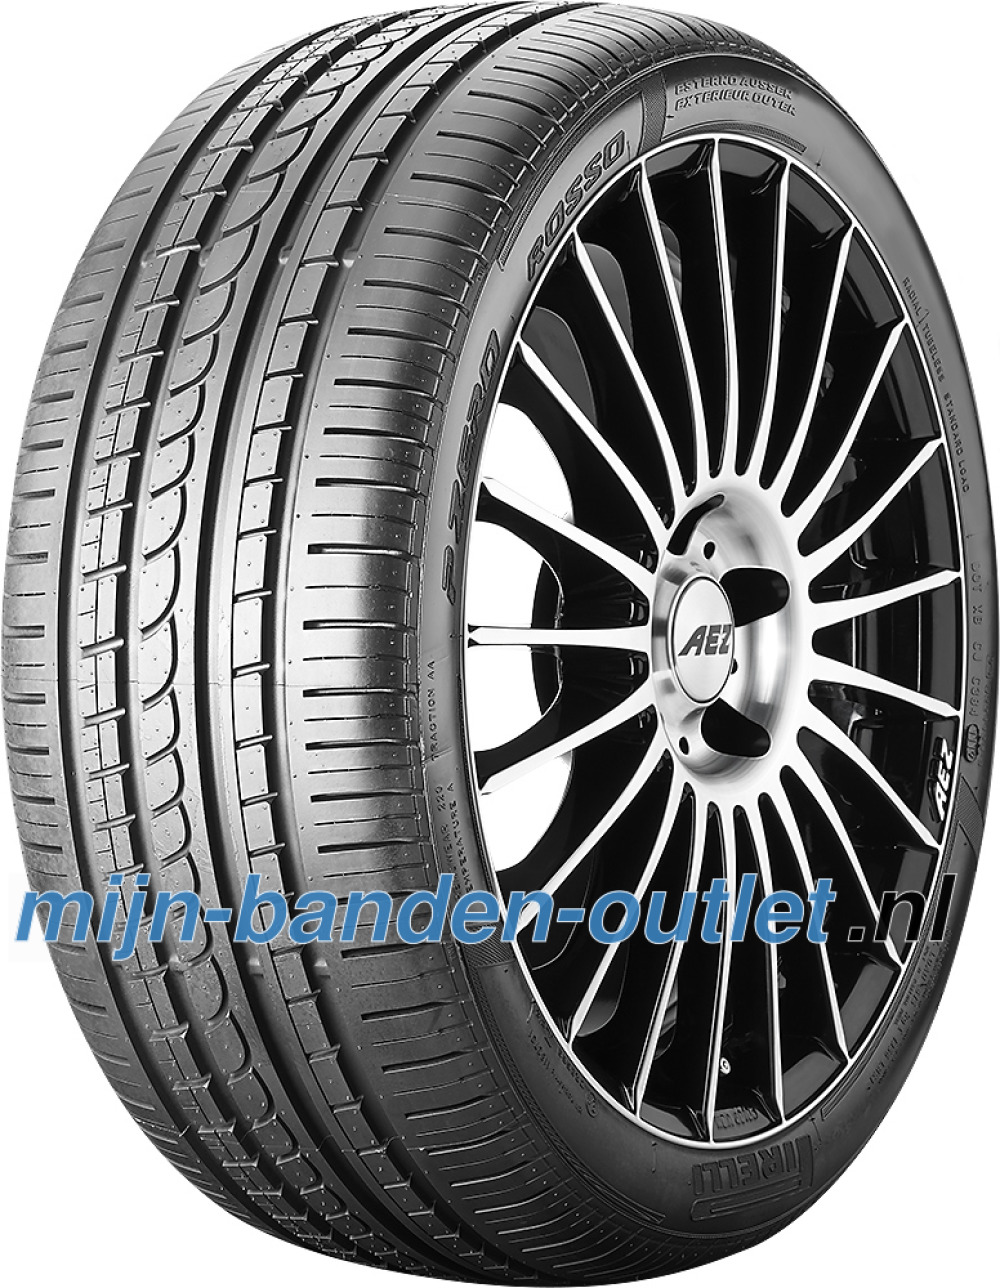 Pirelli P Zero Rosso Asimmetrico ( 275/45 R18 103Y MO, met velgrandbescherming (MFS) )